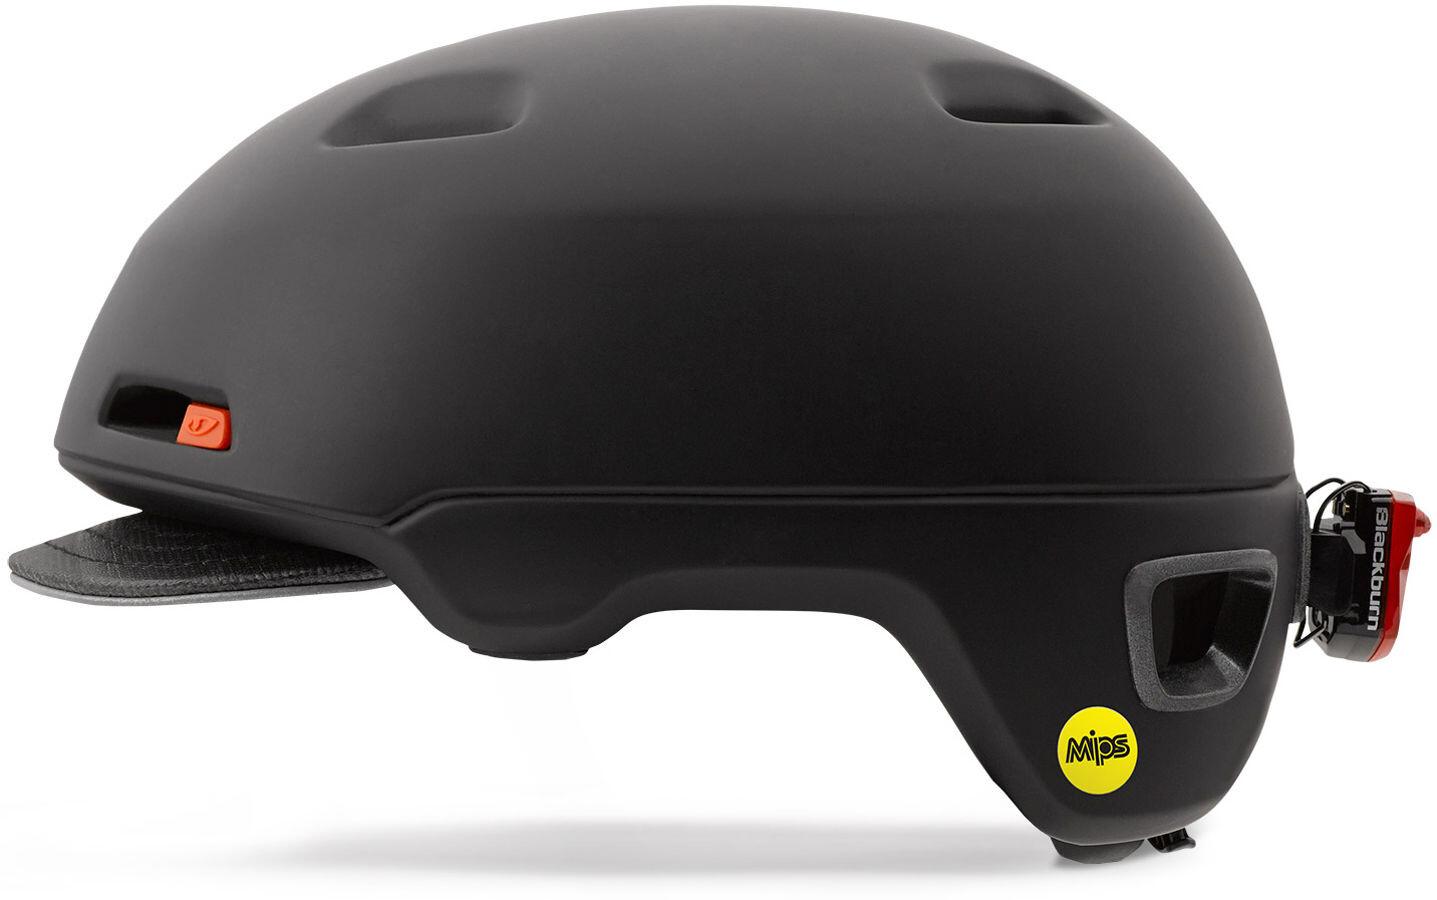 Giro Sutton MIPS Cykelhjälm svart - till fenomenalt pris på Bikester 103afd91f6b1a